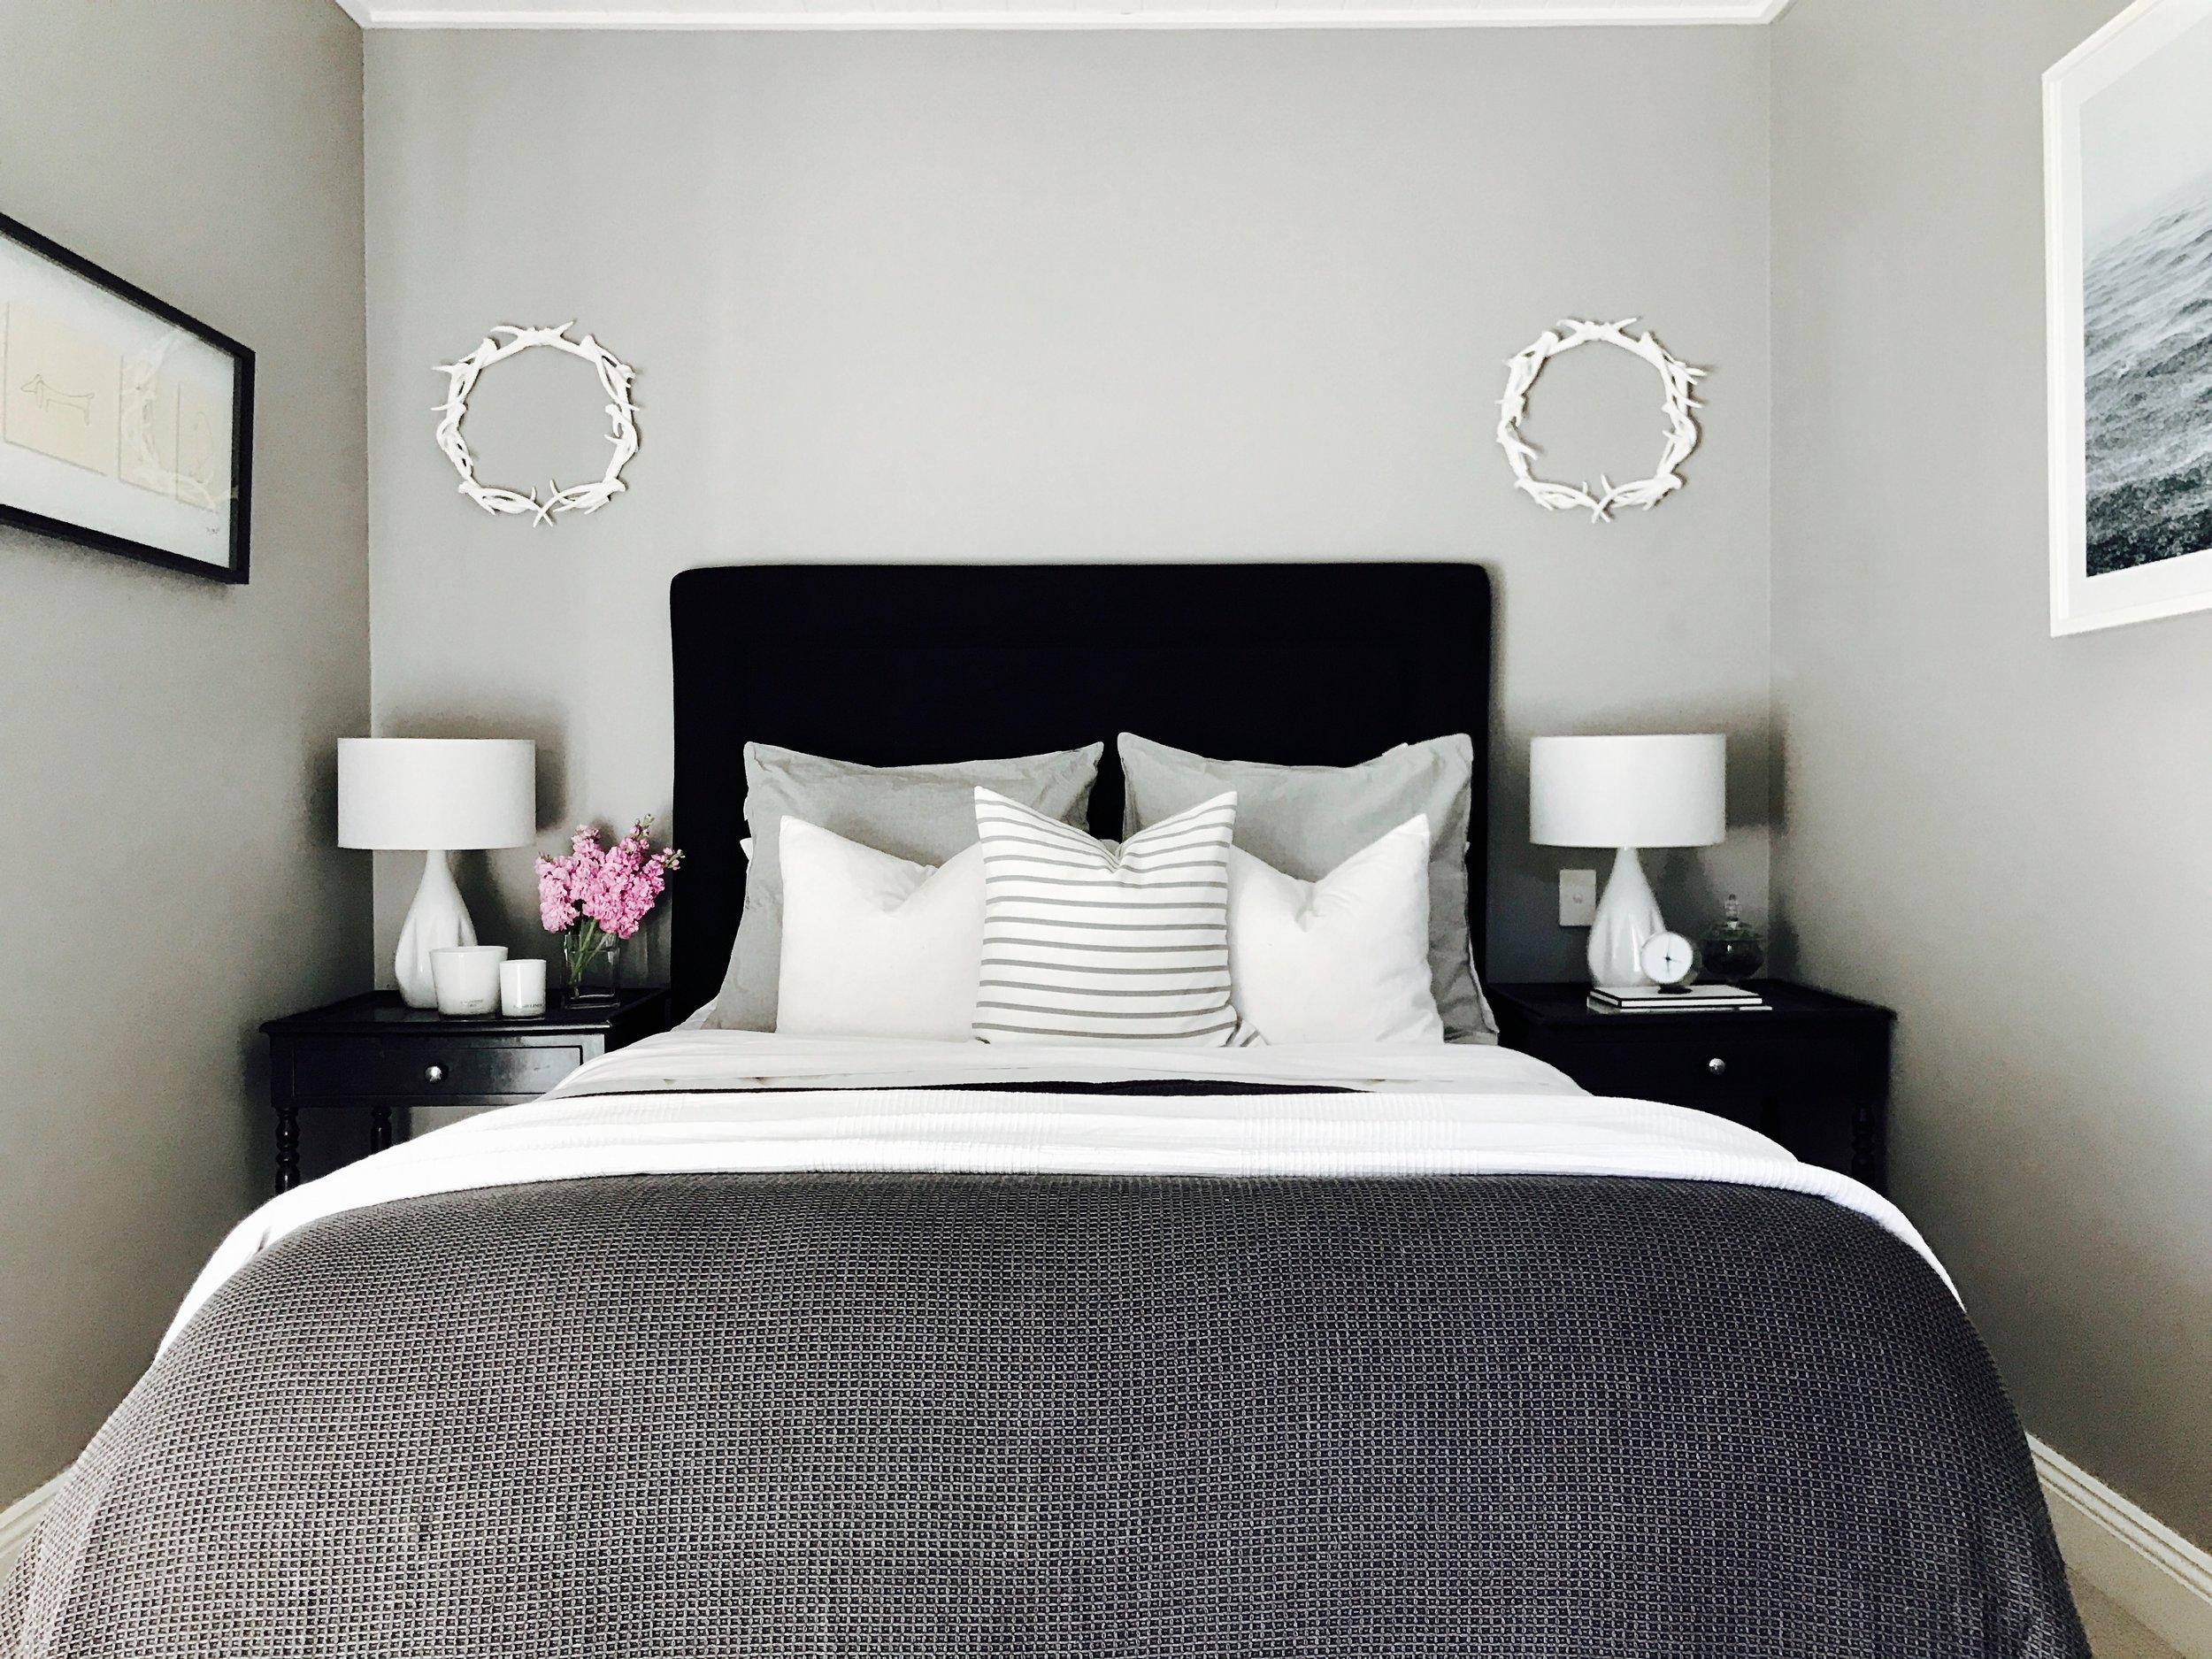 interior-decorating-bedroom-Liz-Hayward.jpg